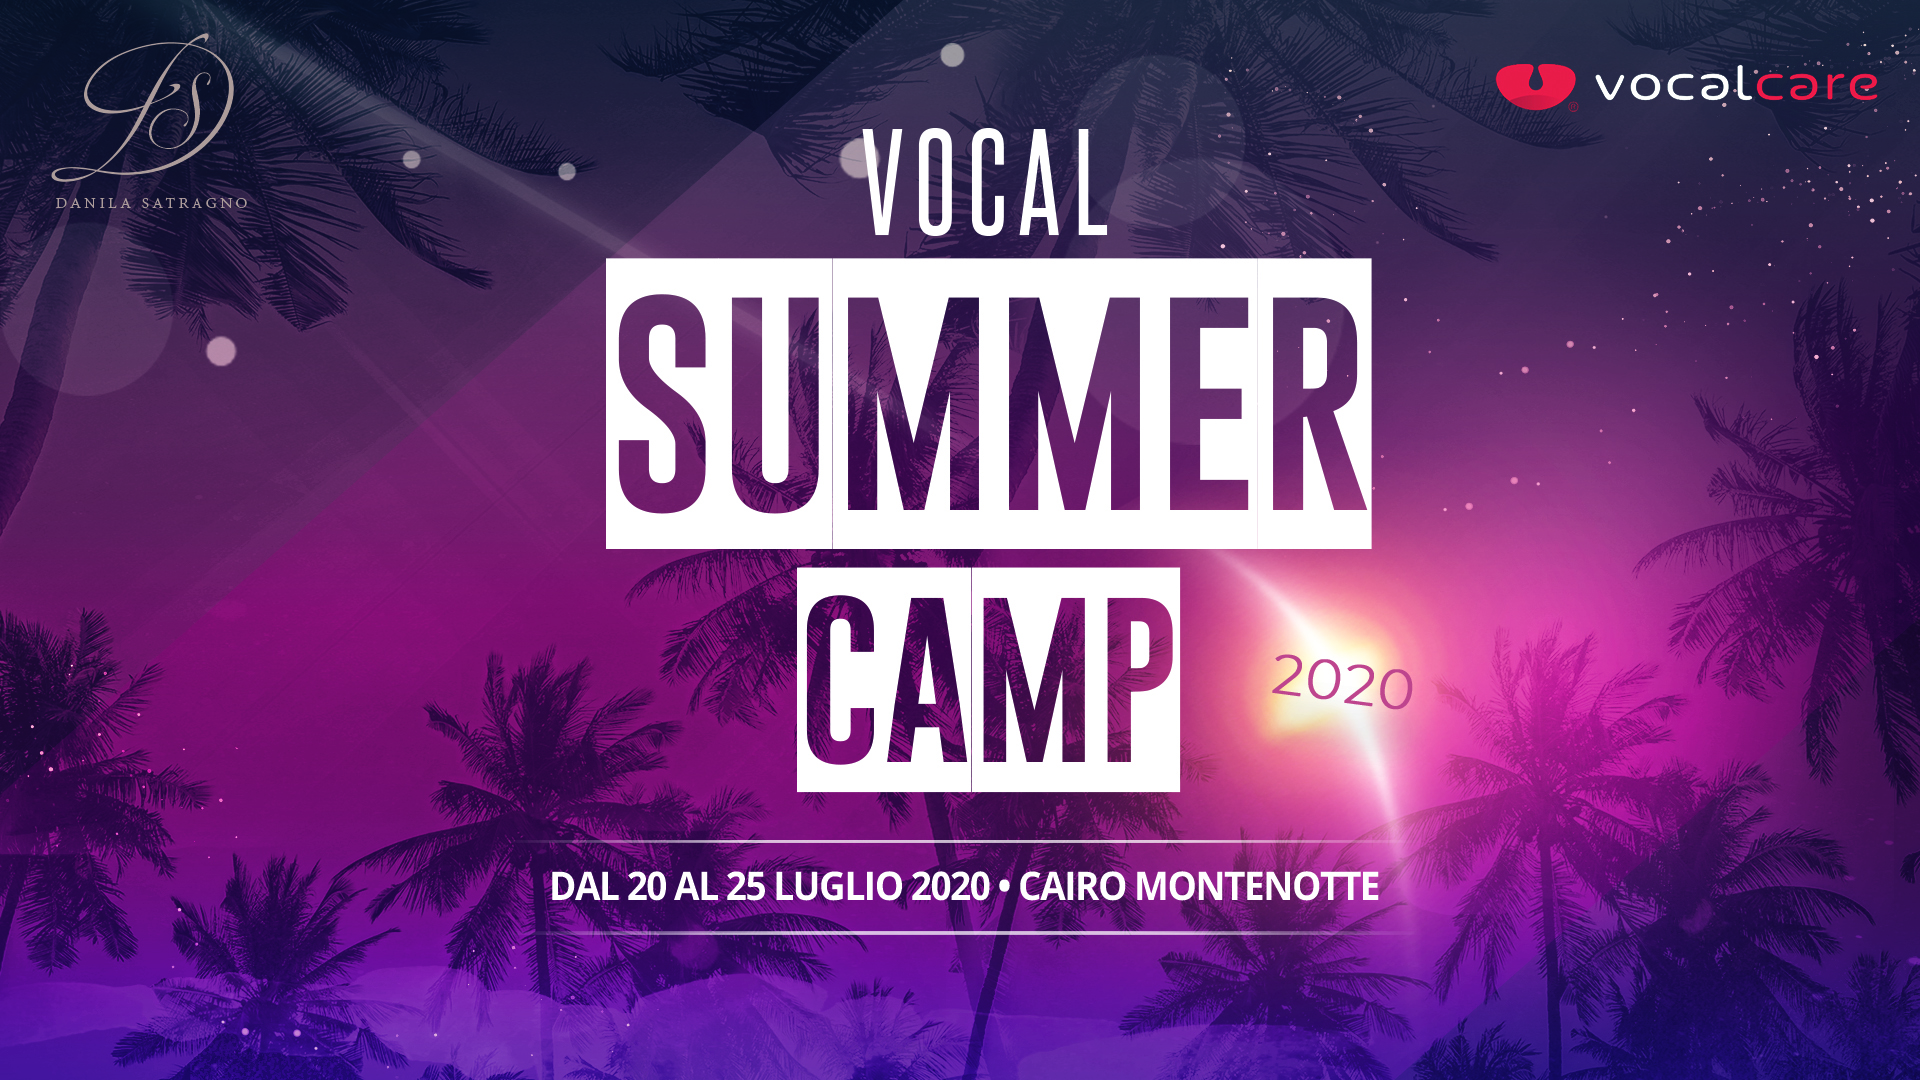 VOCAL CAMP INTERNETT